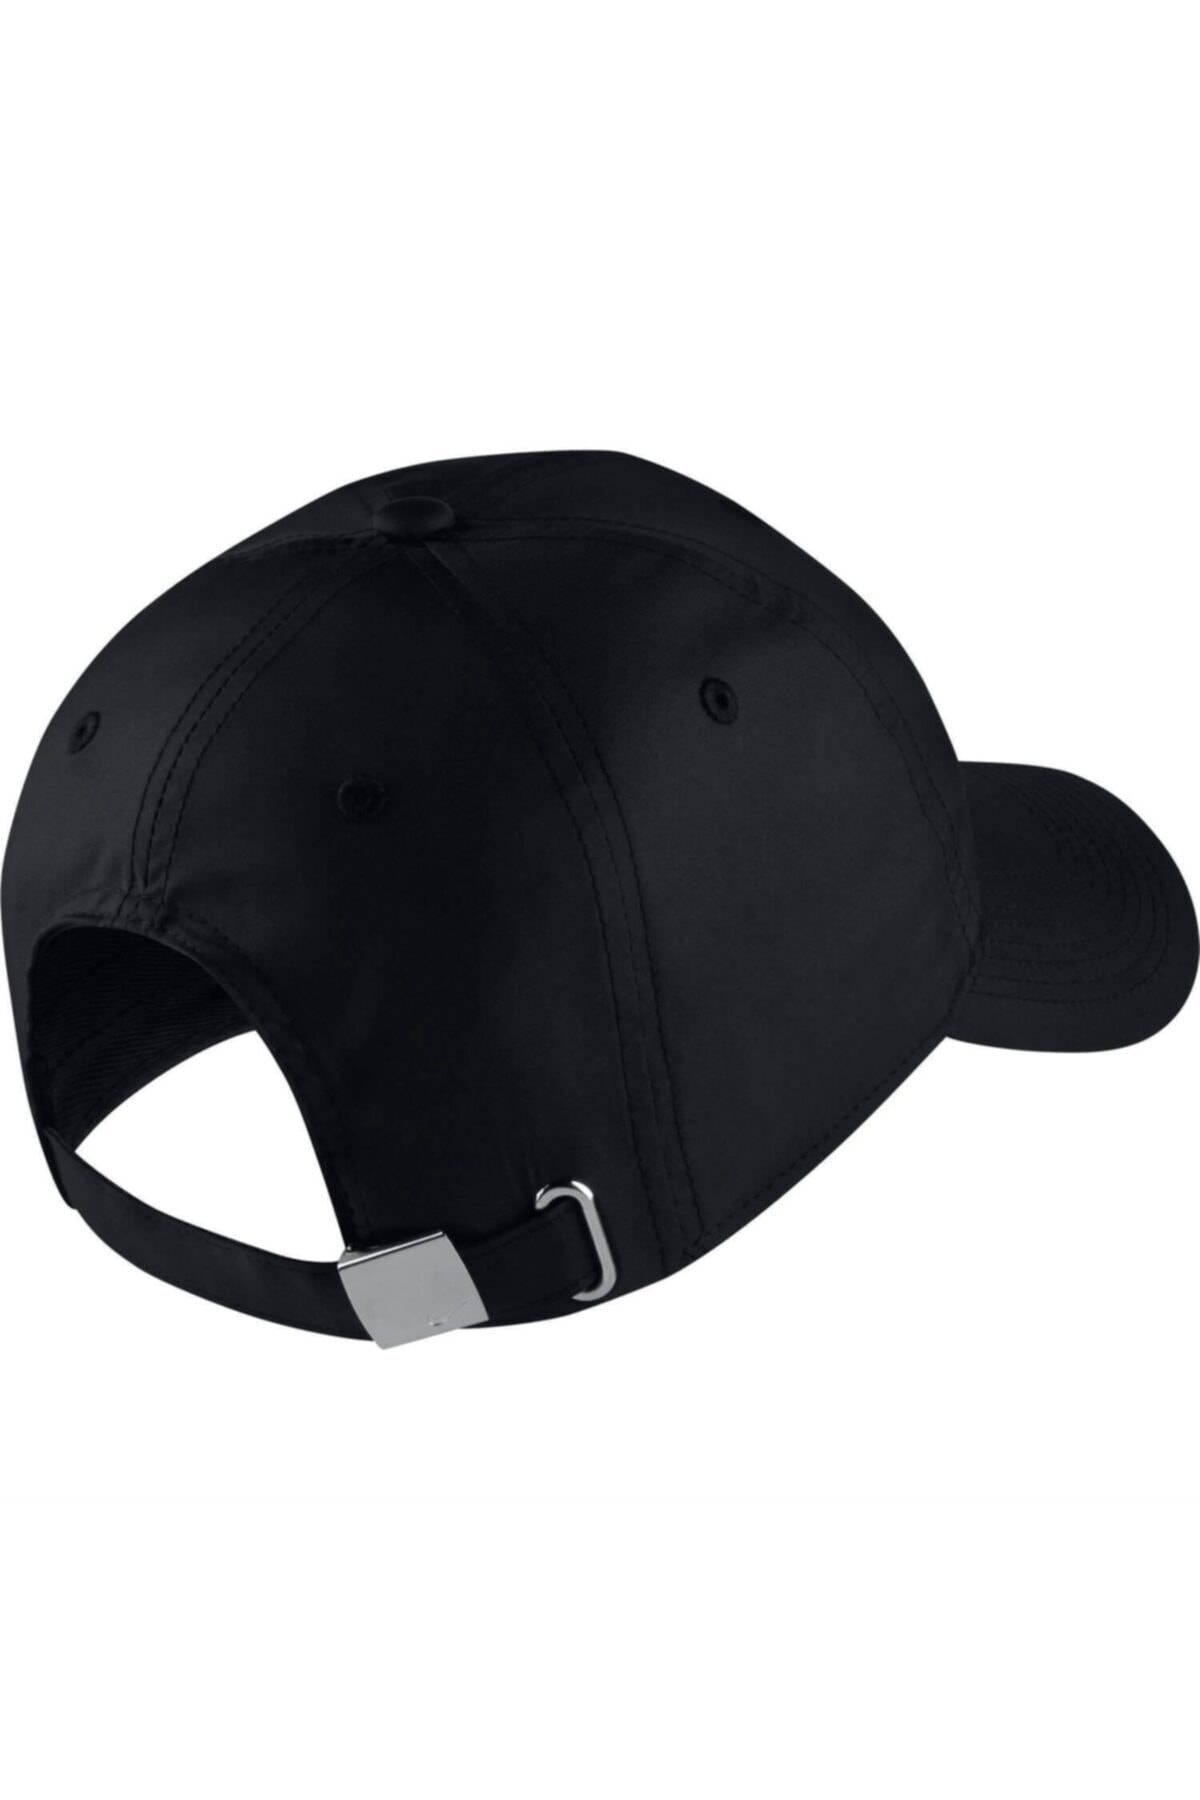 Nike Unisex Siyah Metal Swoosh Ayarlanabilir Şapka 943092-010 2